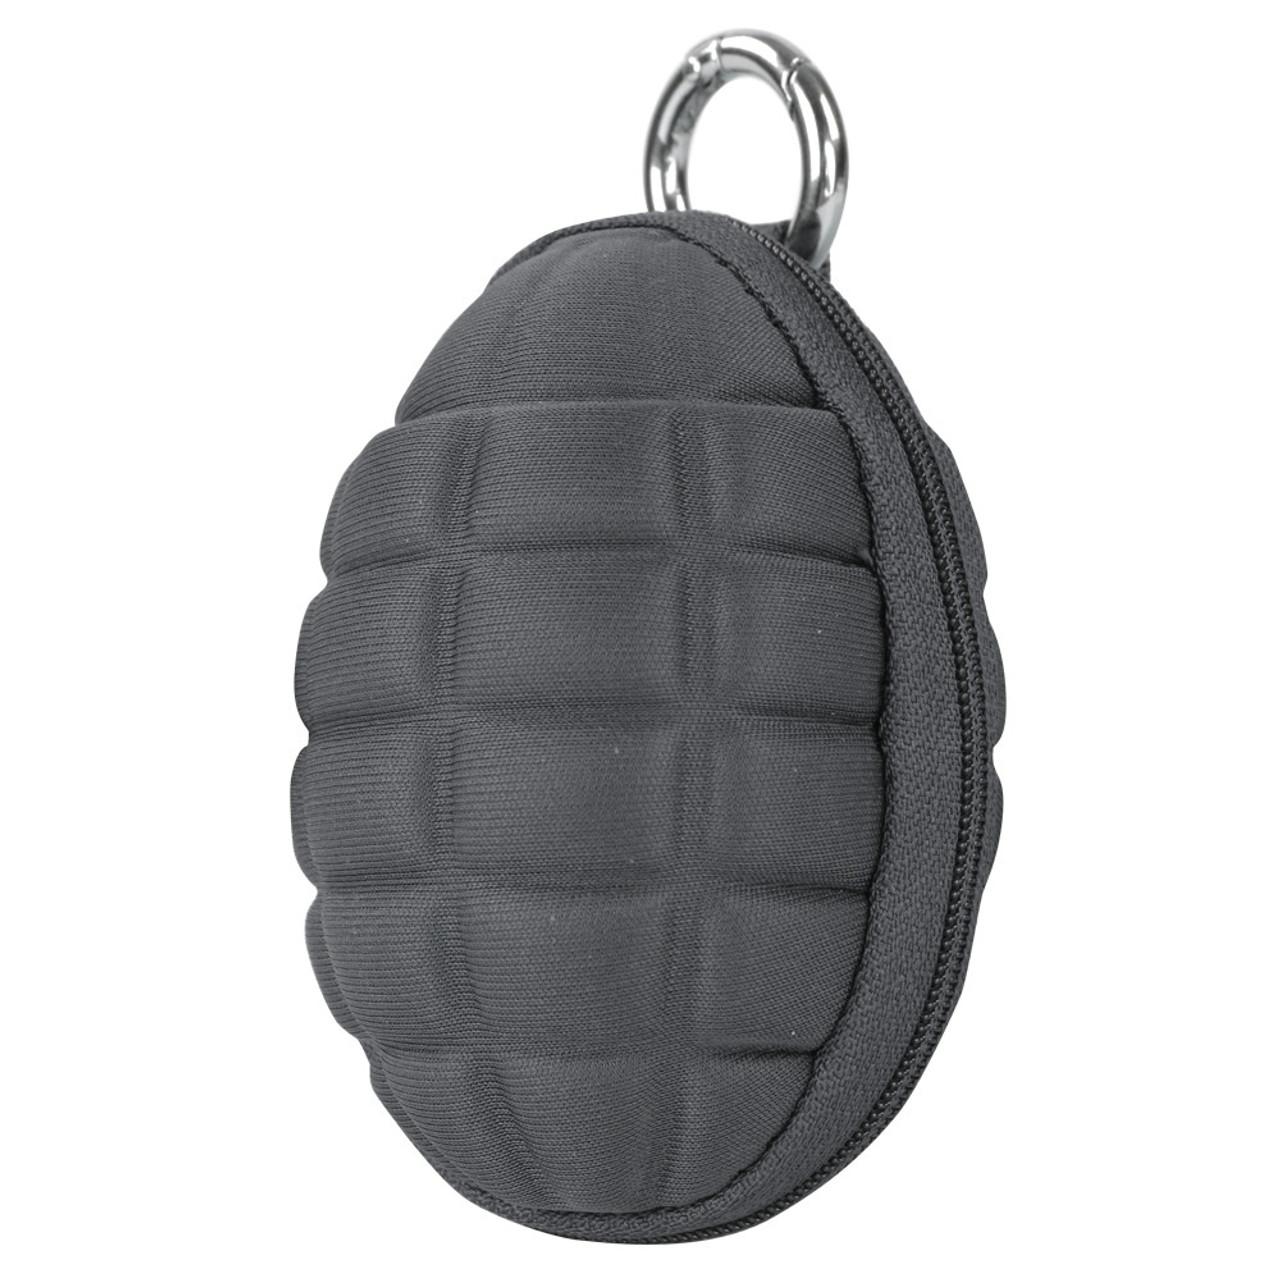 Grenade Key Chain Pouch - Slate Gray